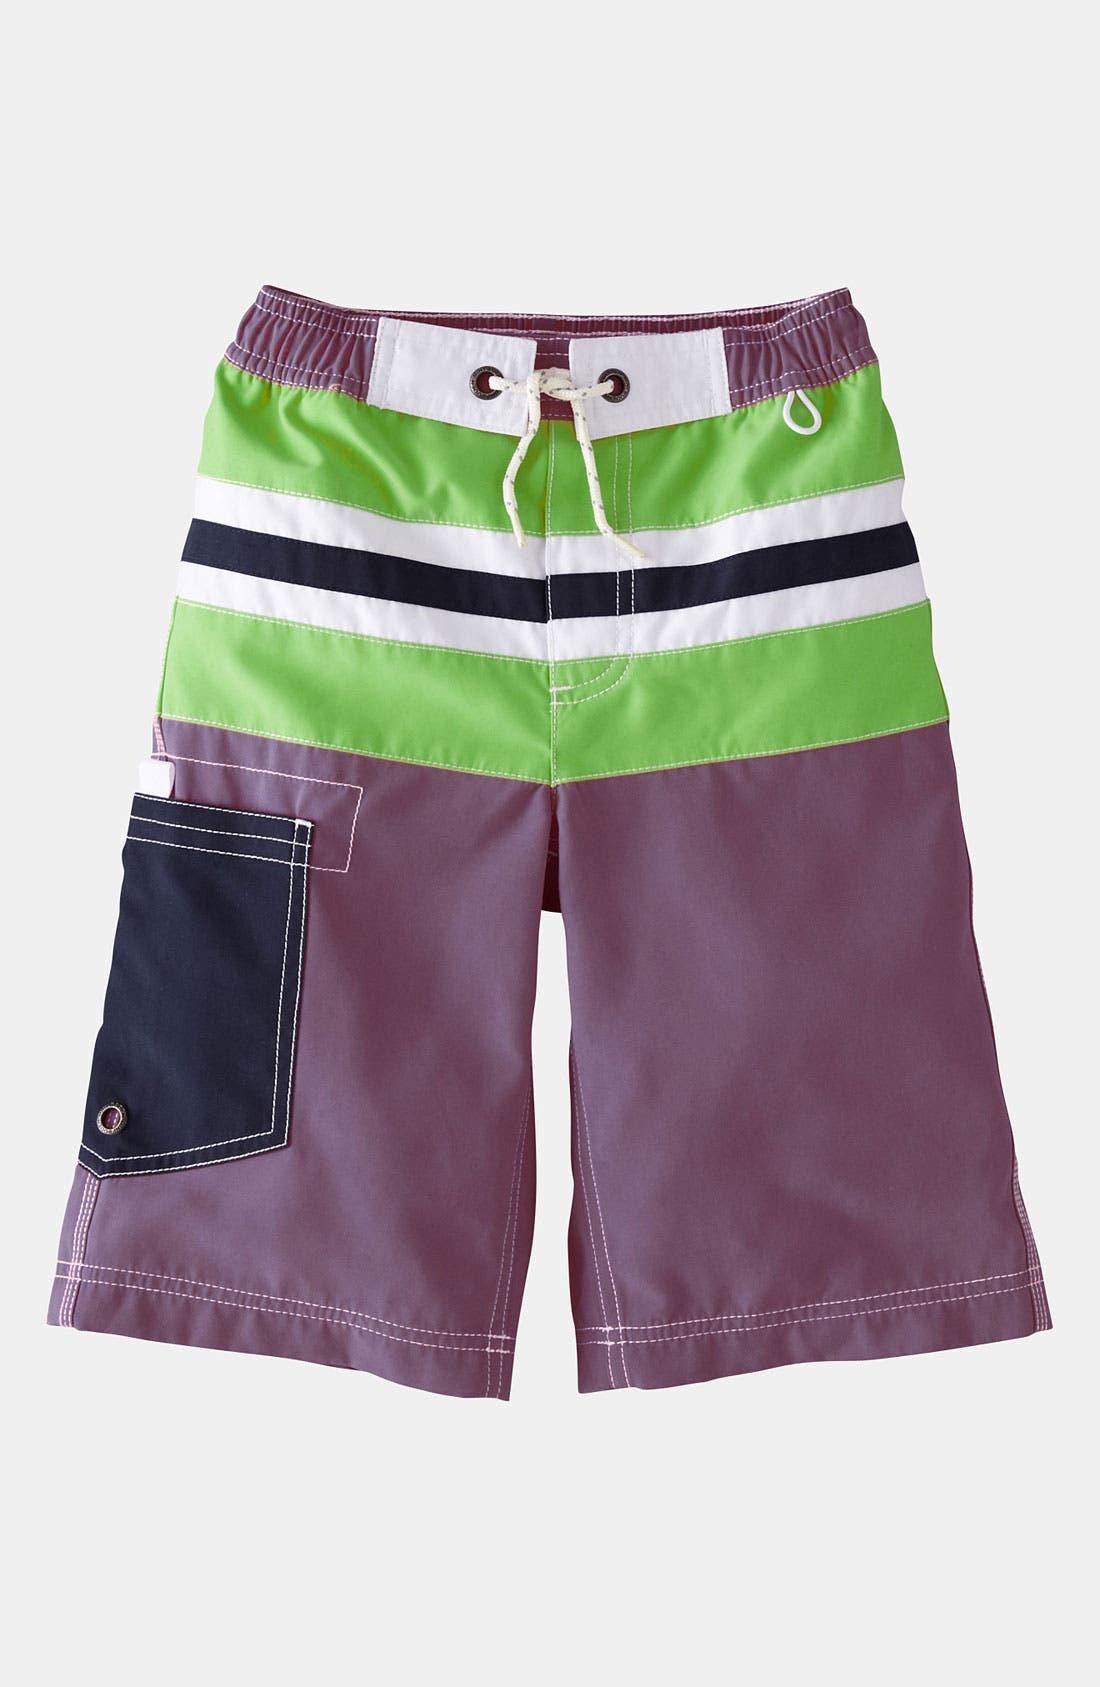 Alternate Image 1 Selected - Mini Boden 'Surf' Shorts (Little Boys & Big Boys)